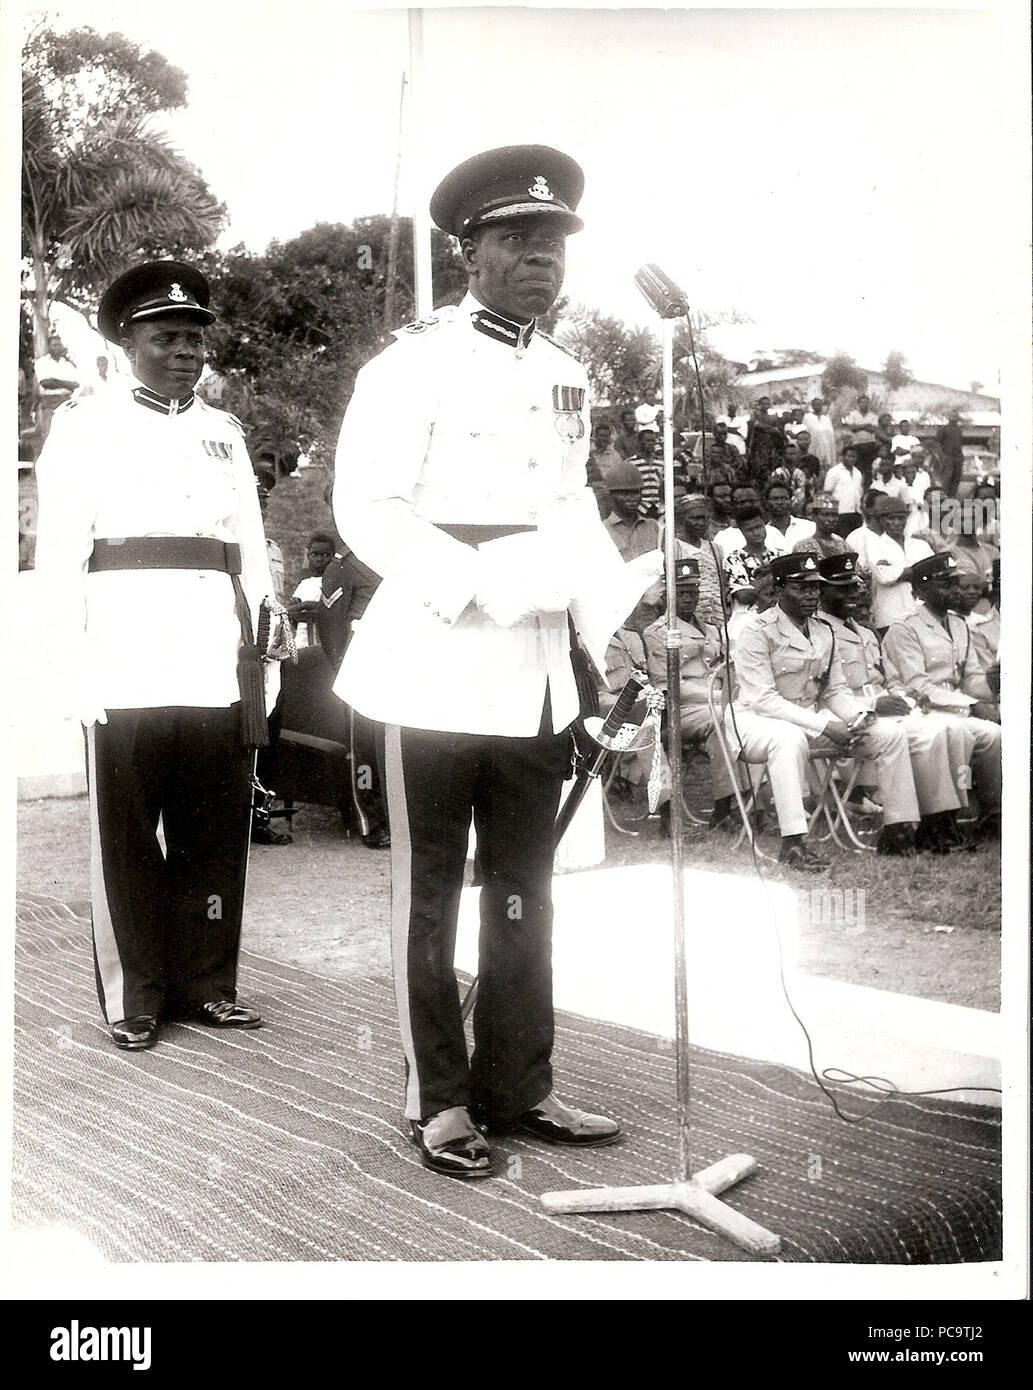 508 Queen Elizabeth awarded Olufunwa a CPM (Colonial Police